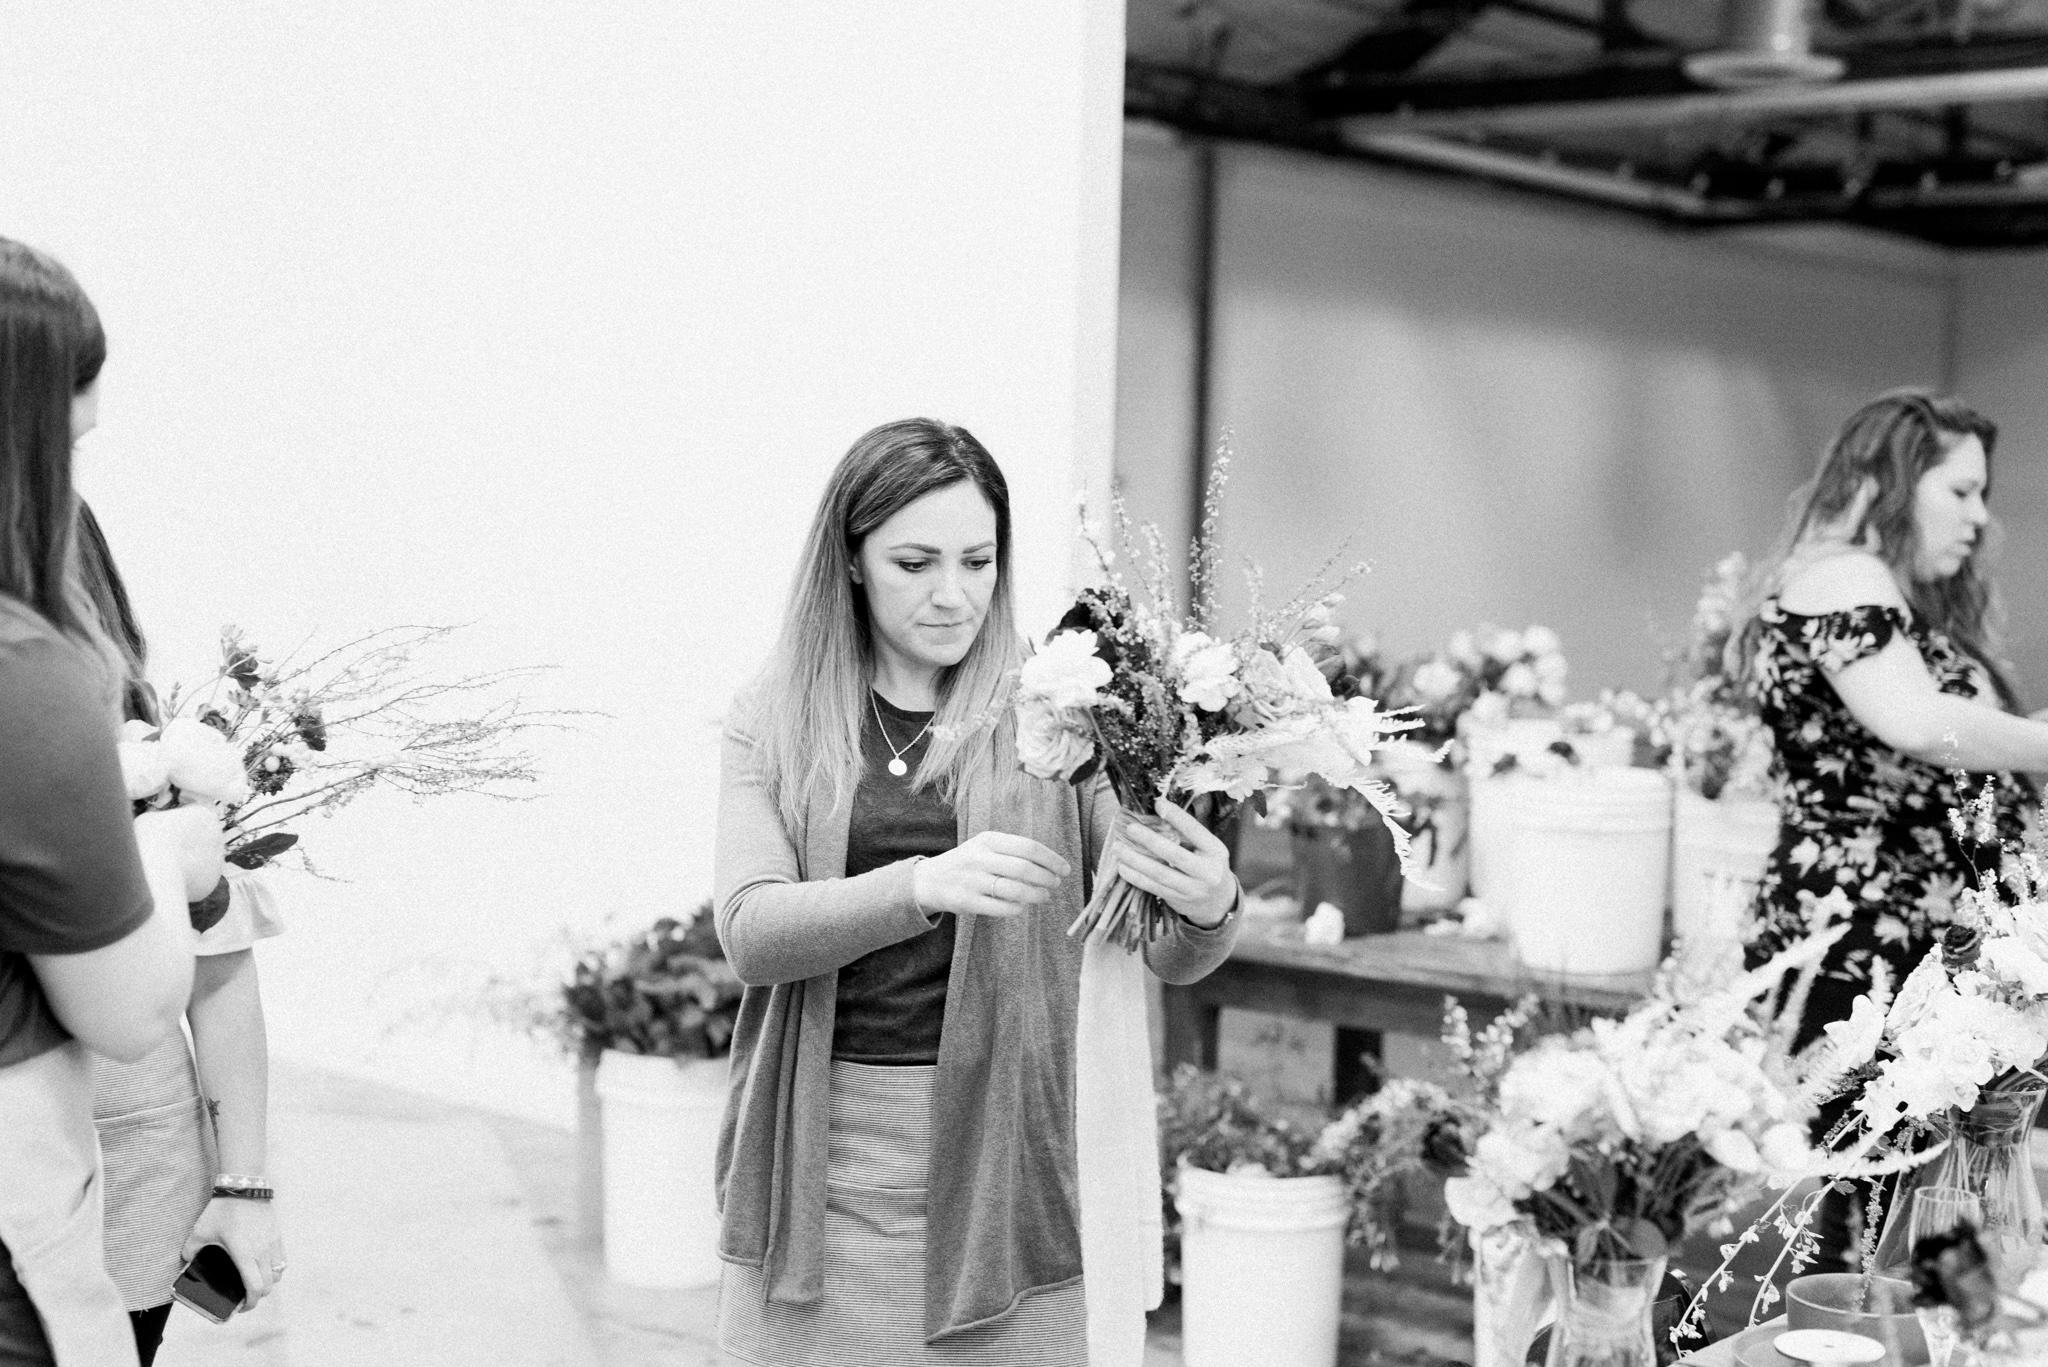 Cultivate Goods Floral Workshop - The Doyle - Kristen Krehbiel - Kristen Kay Photography-44.jpg